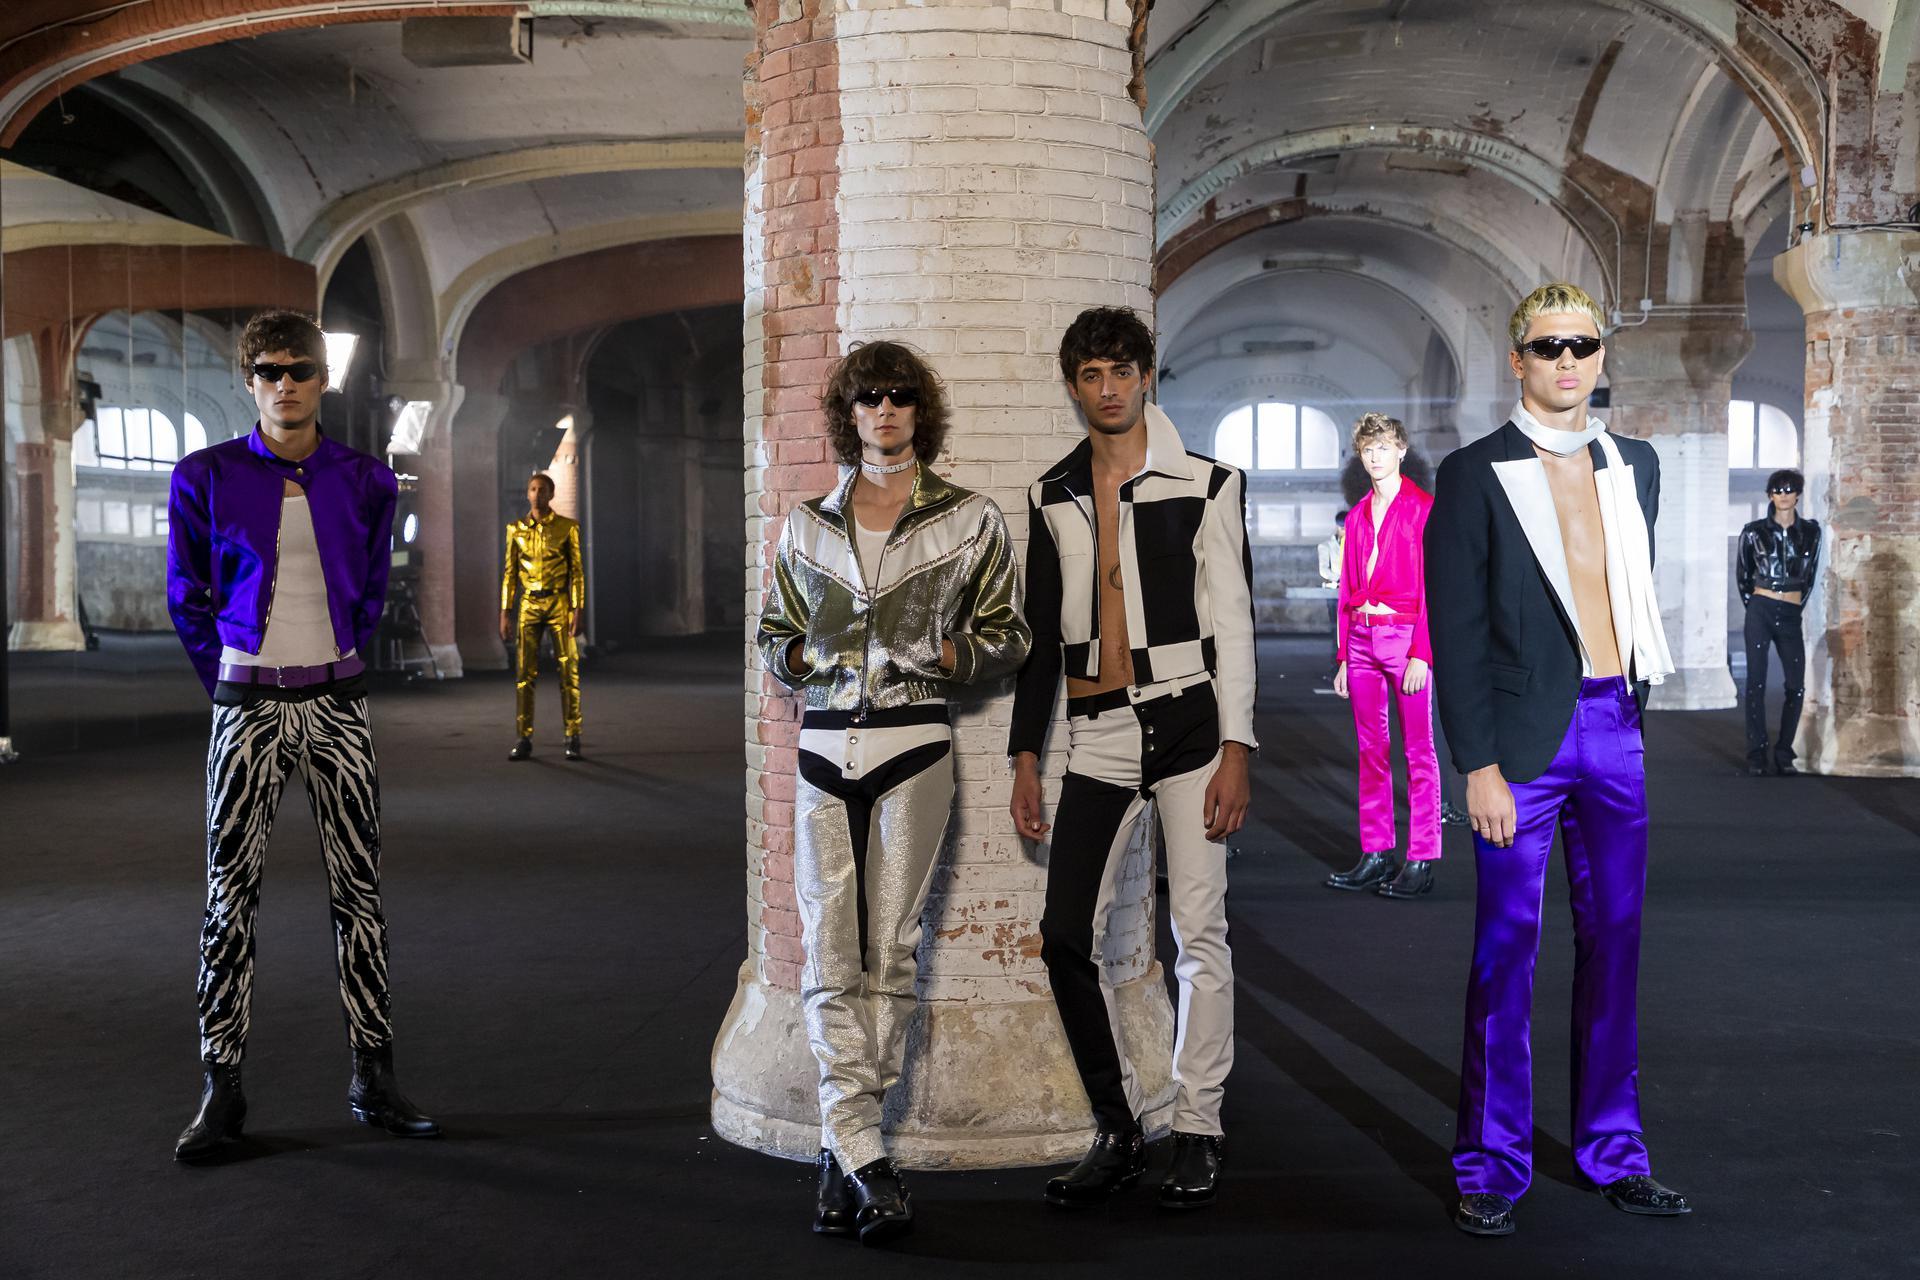 Guillem%20Rodriguez%20ambient 1127 - Segunda sesión de la pasarela digital 080 Barcelona Fashion